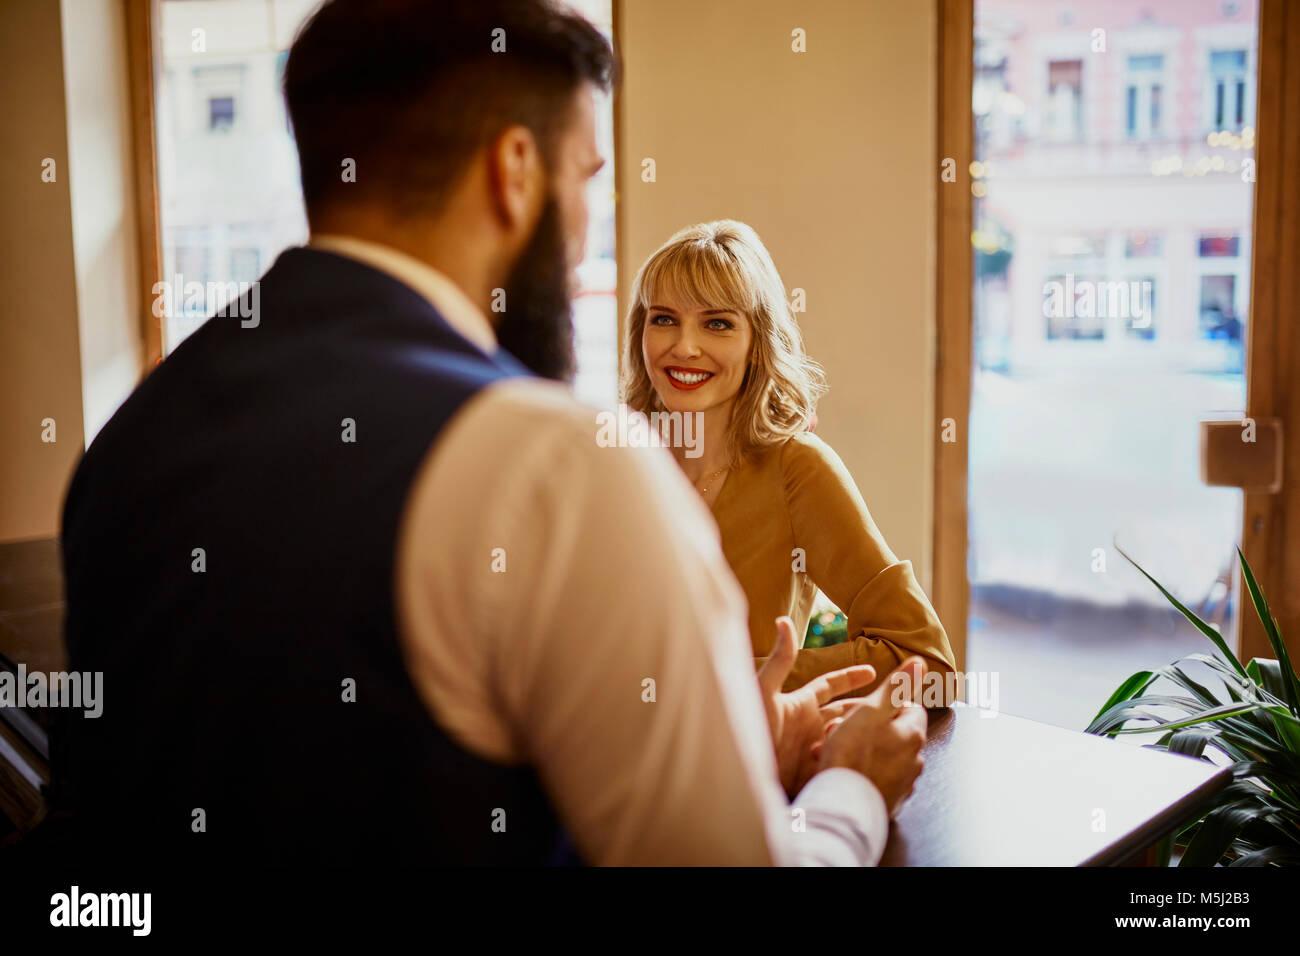 Elegante Frau an Mann in einer Bar lächelnd Stockbild